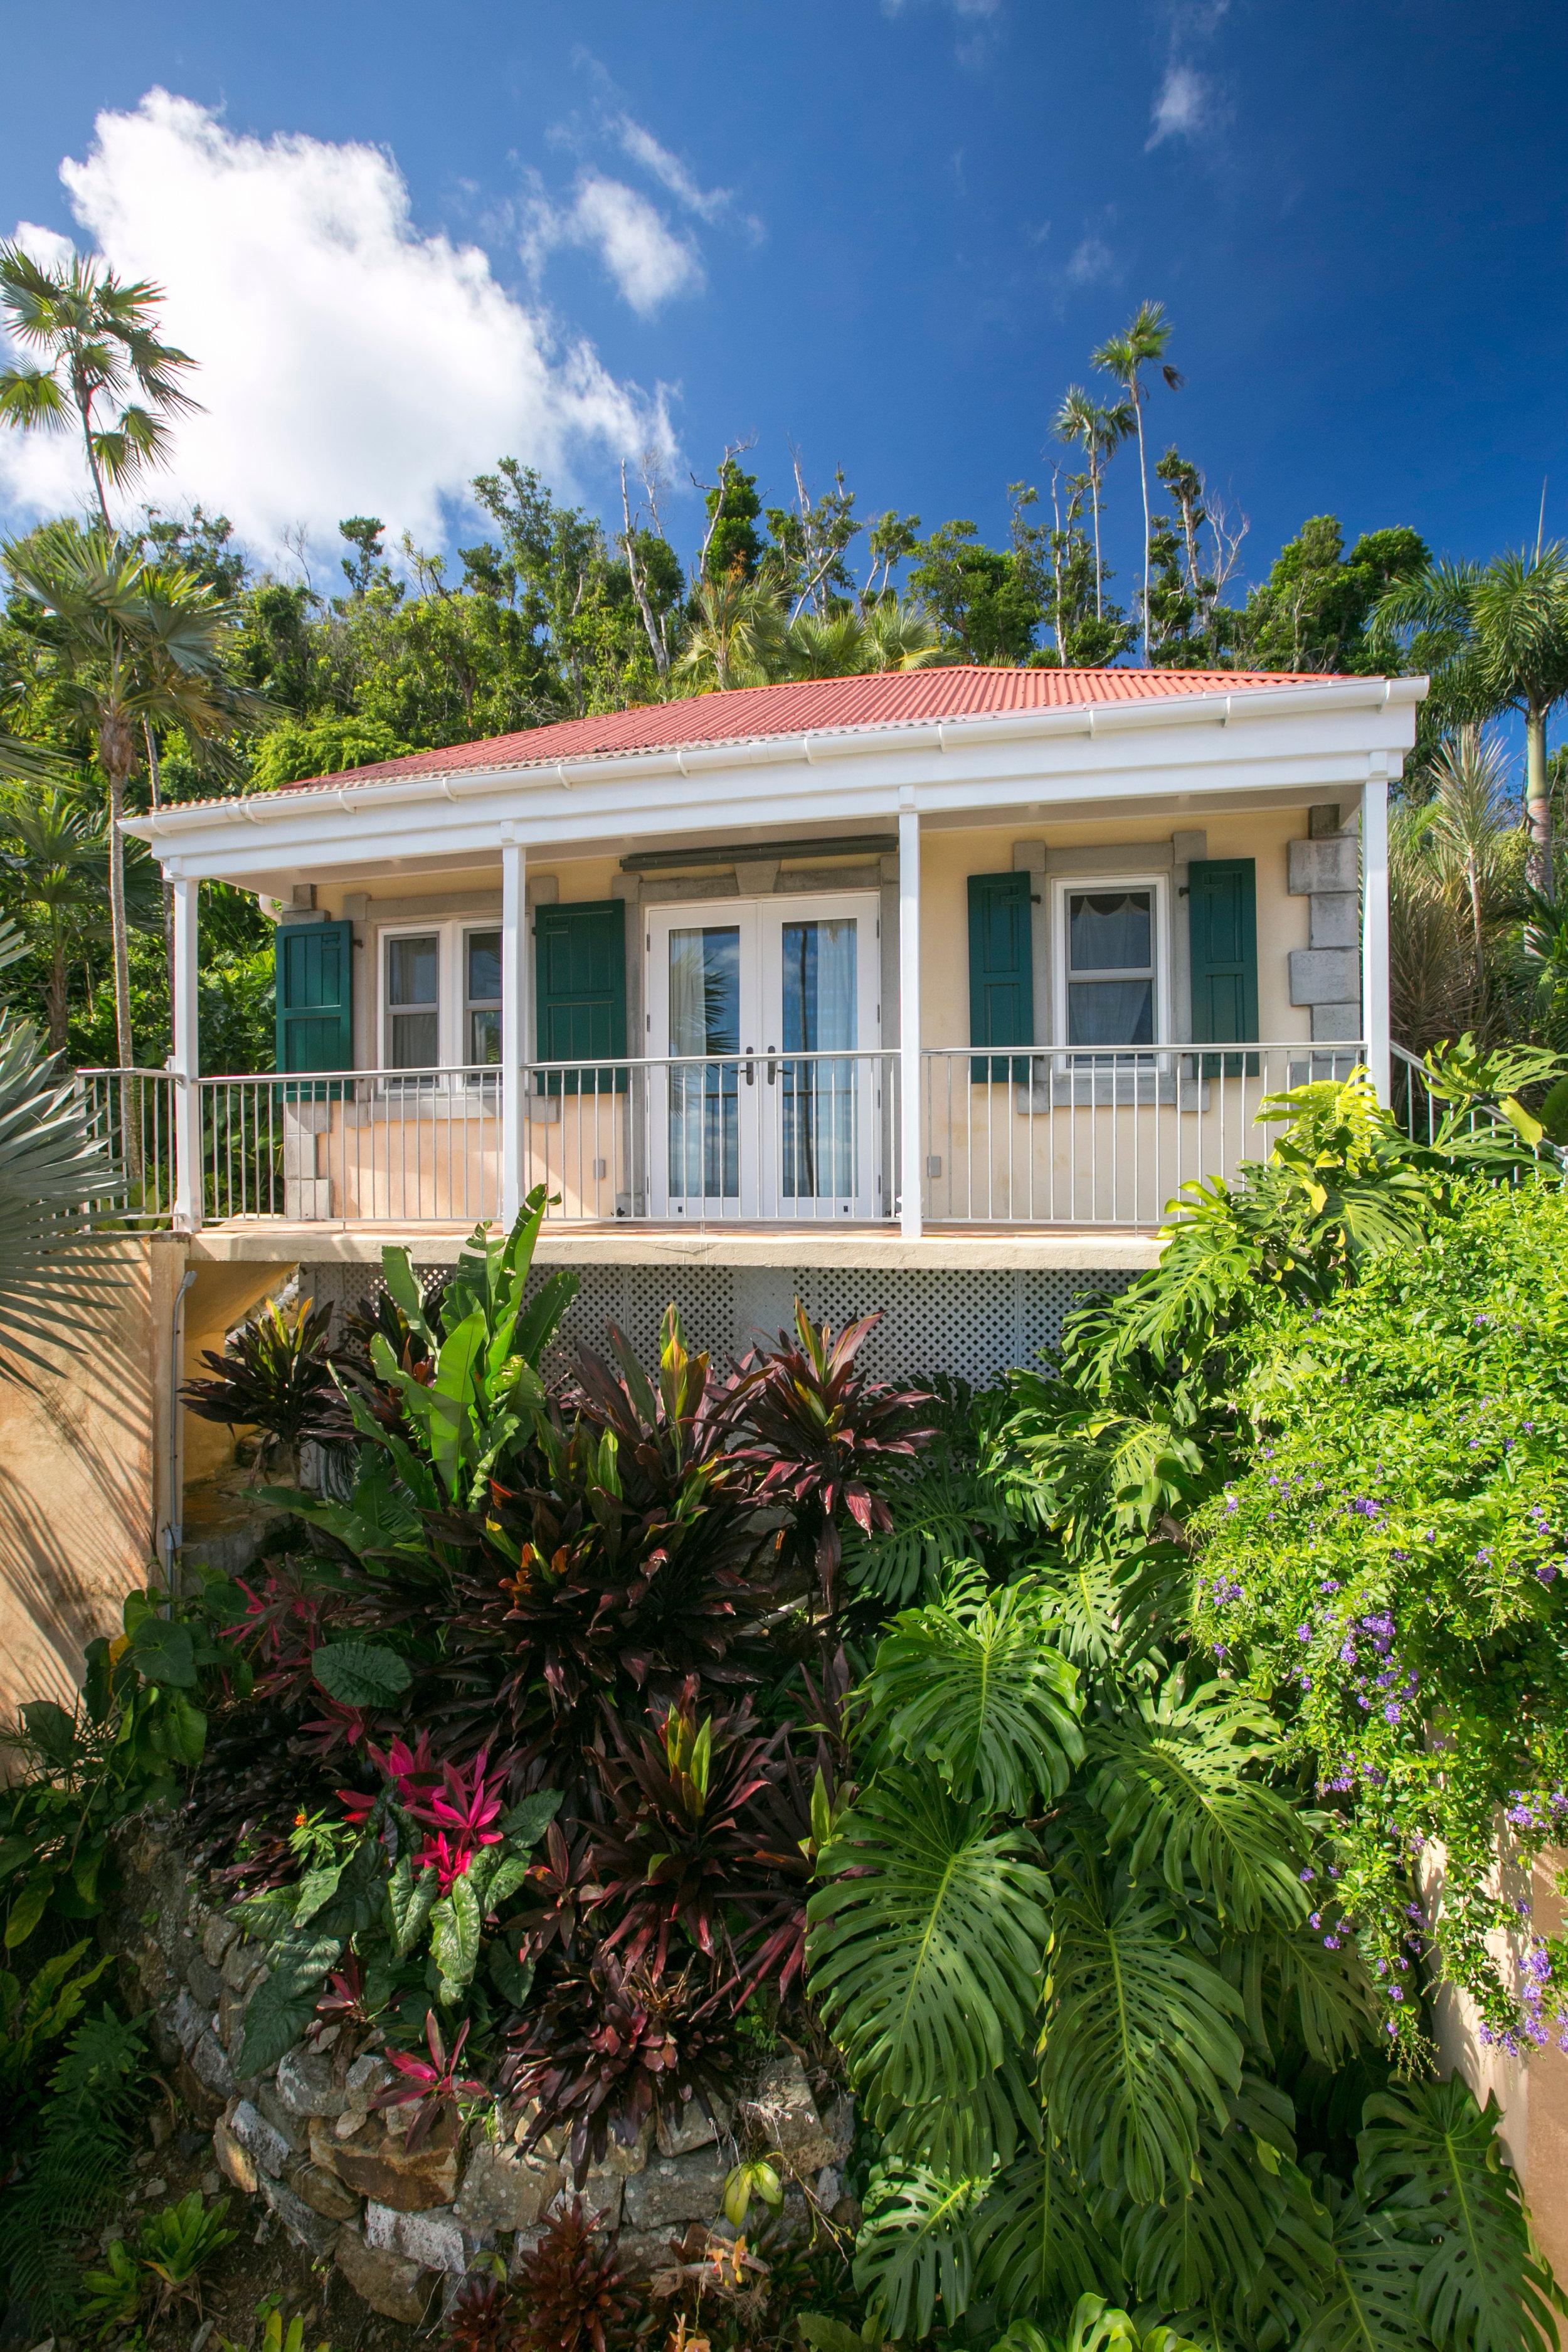 drakesview_cottage-5D3B5359.jpg